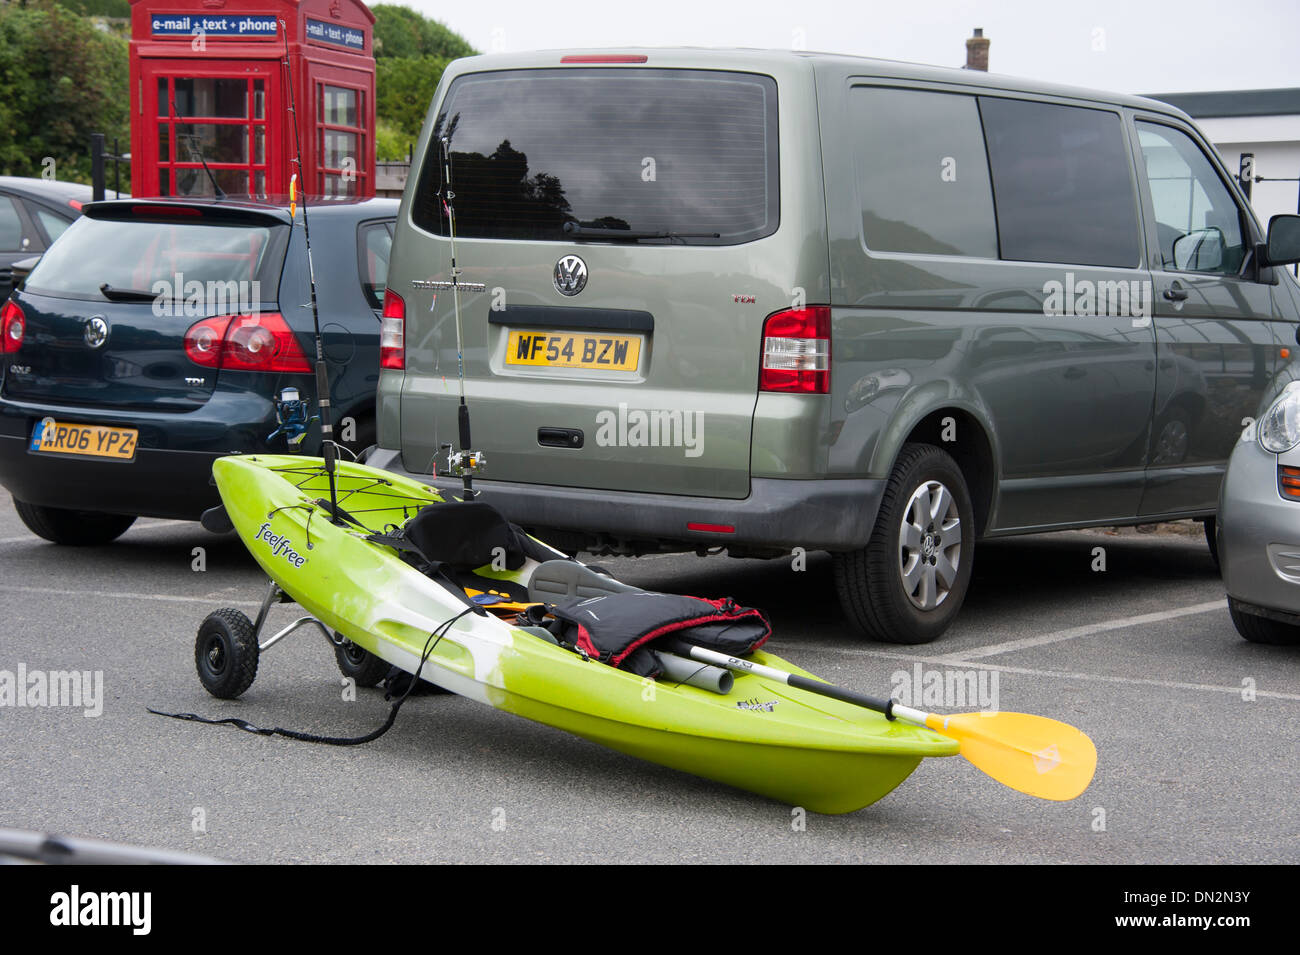 Surfers canoe Boat by VW van on wheels fishing - Stock Image